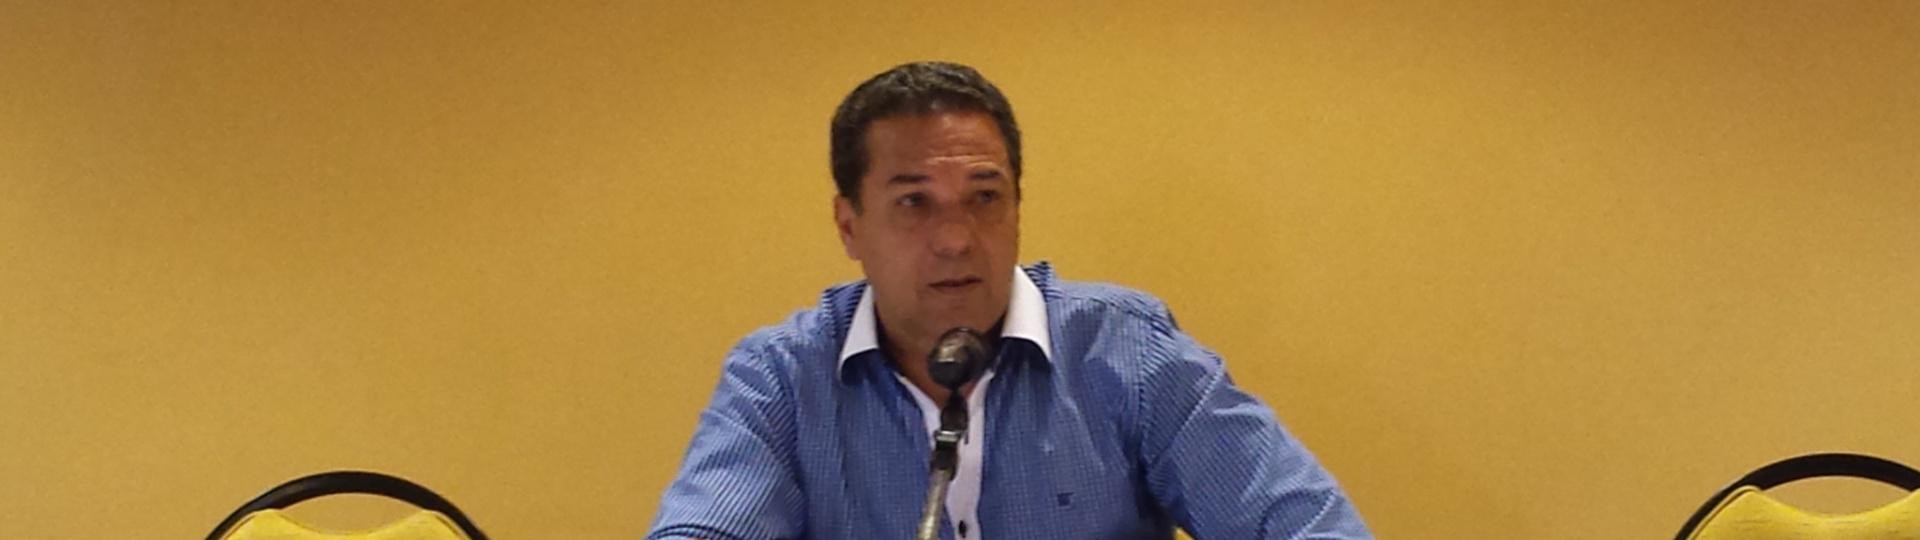 26 mai. 2015 - Vanderlei Luxemburgo concede entrevista após ser demitido do comando do Flamengo